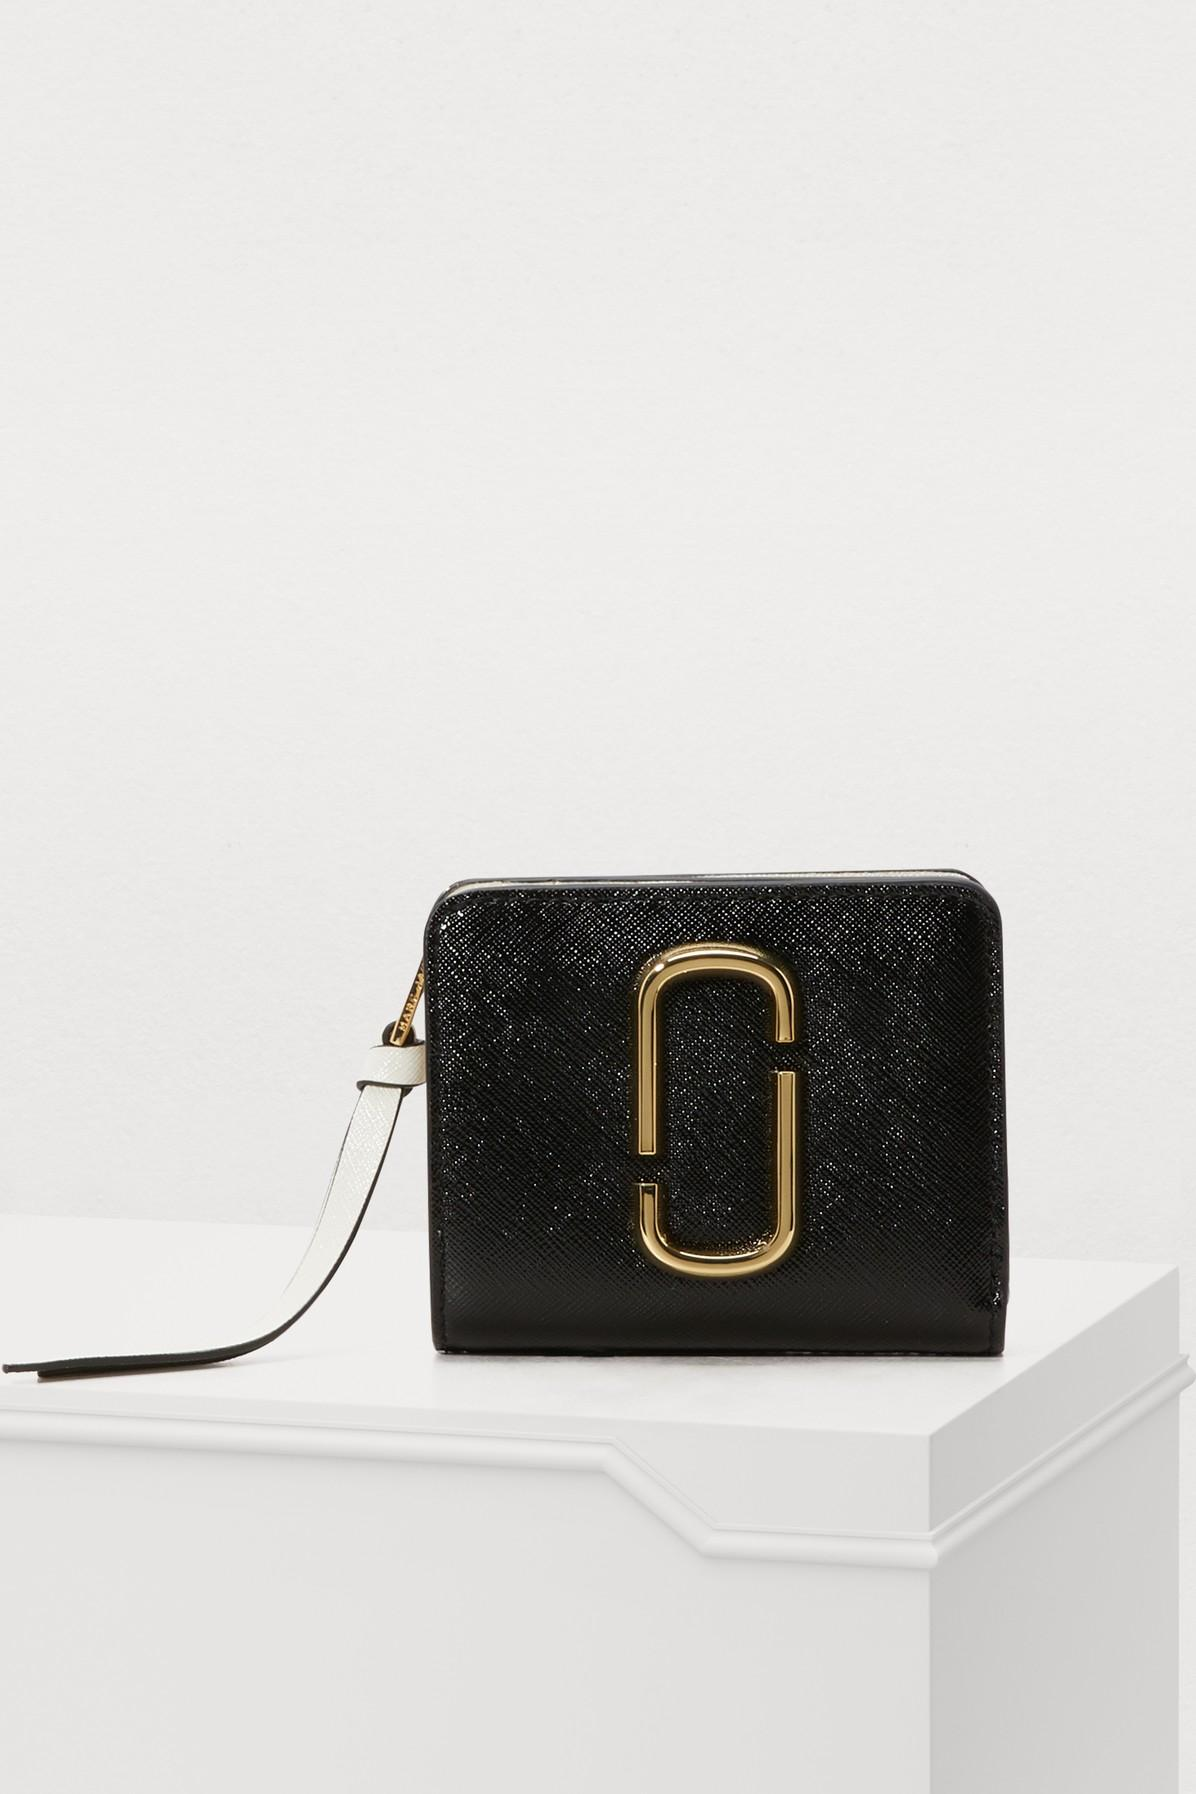 "Marc Jacobs Mini Compact"" Purse"" In Black & Multi"